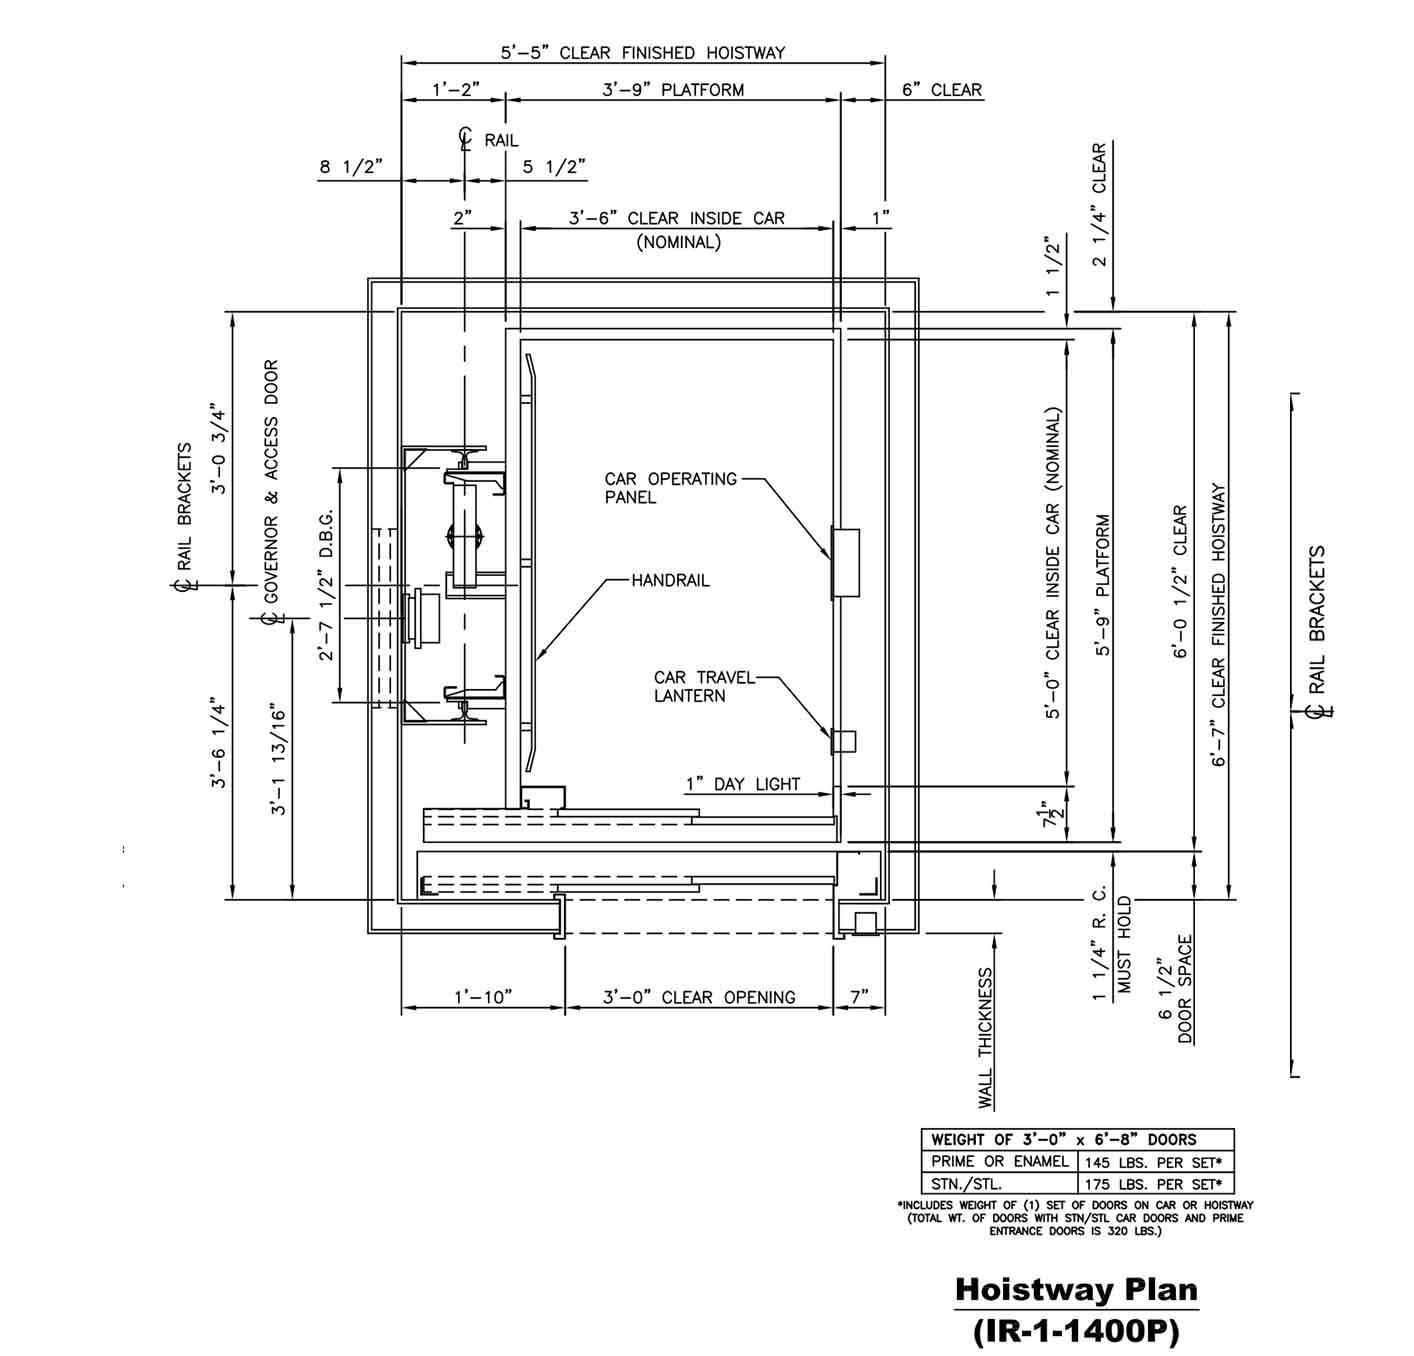 Elevator plan drawing home design inspiration for Elevator plan drawing